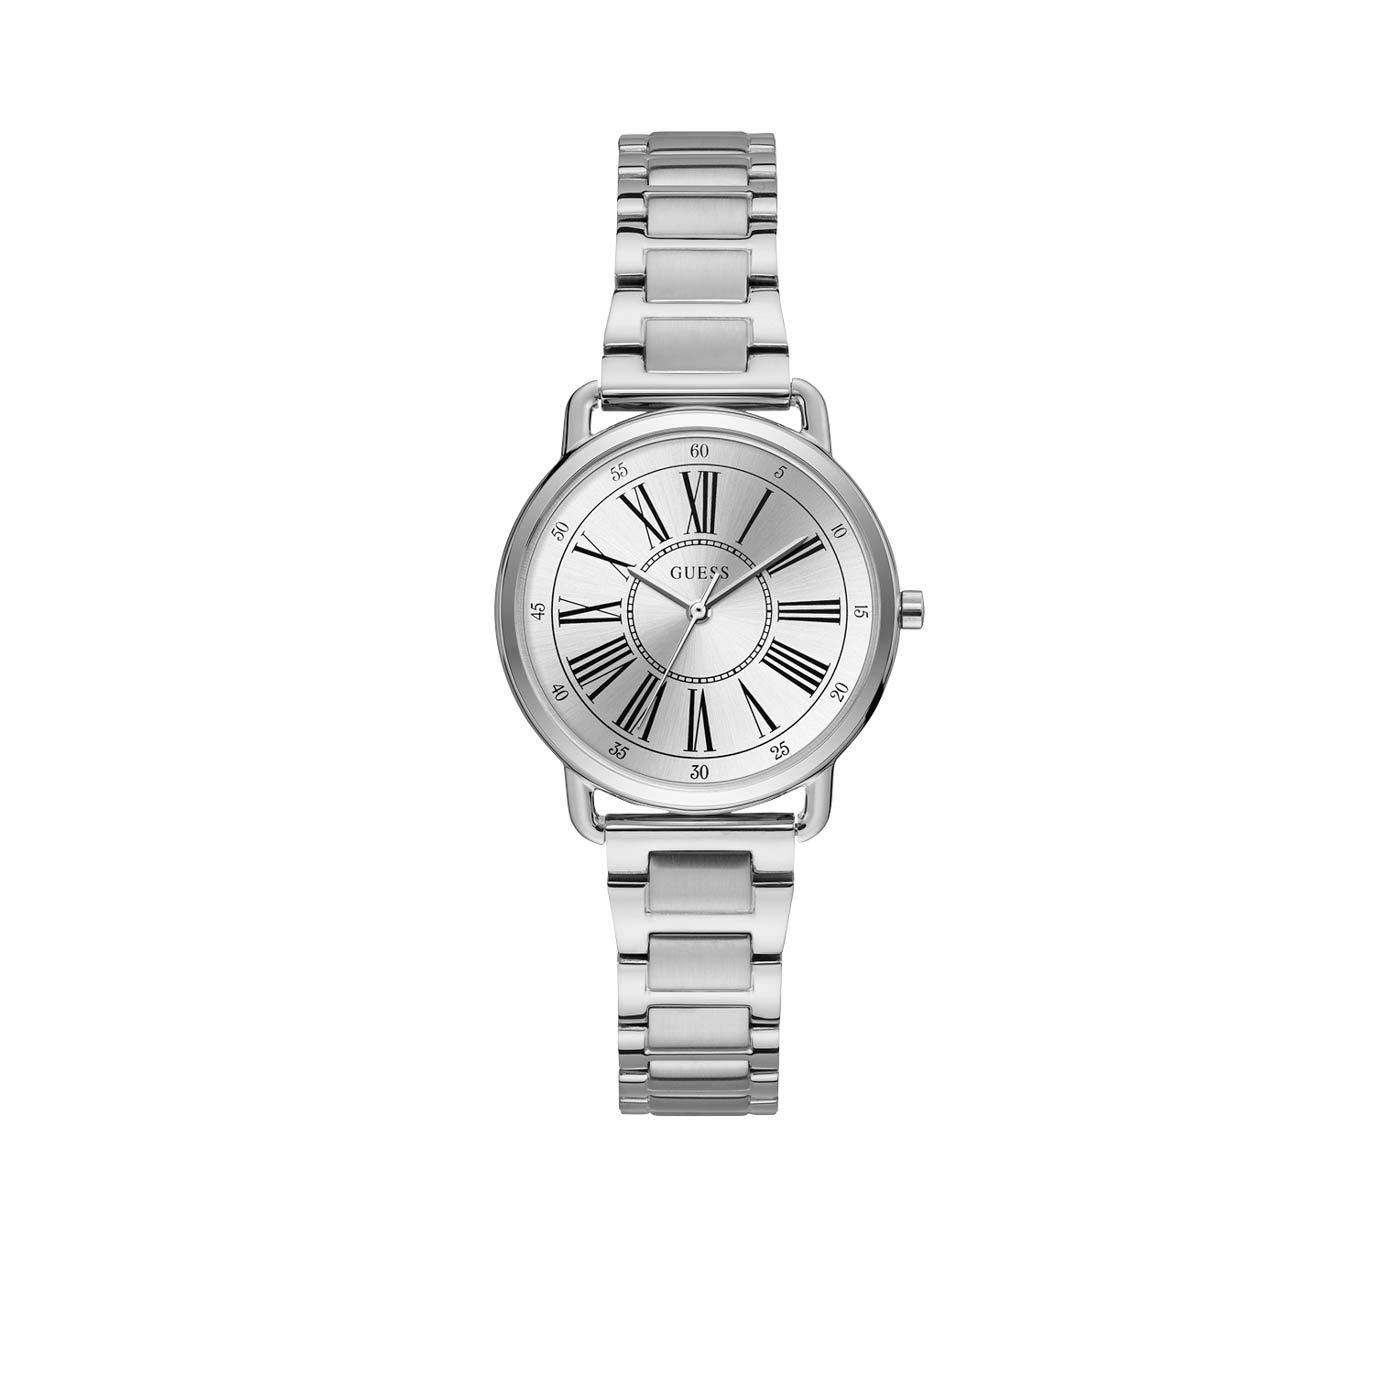 Uhr Mit Damen Edelstahl W1148l1Amazon Guess Quarz Armband Analog zVSpqUM